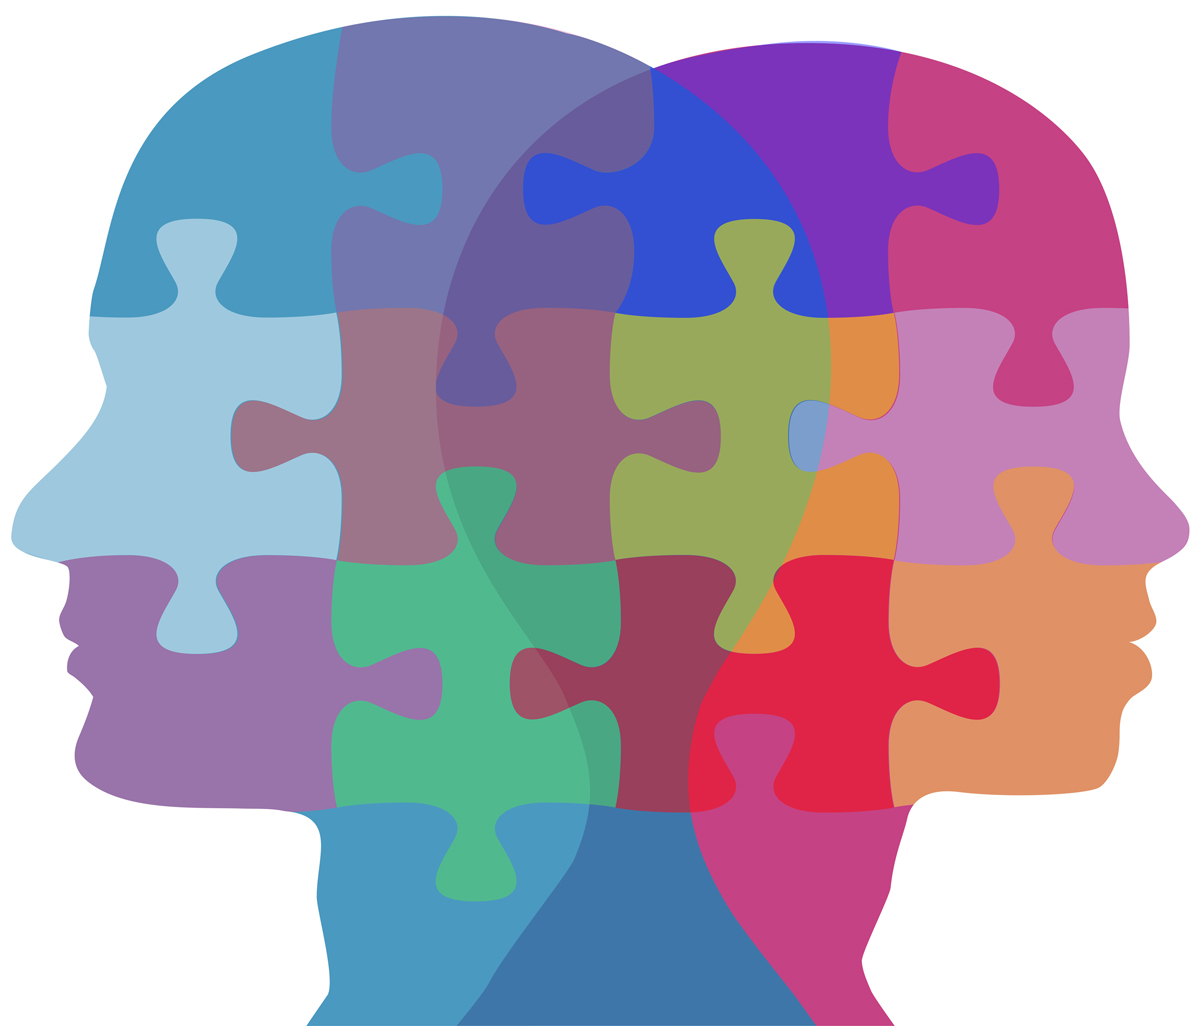 Signs of Emotional Intelligence (EQ)